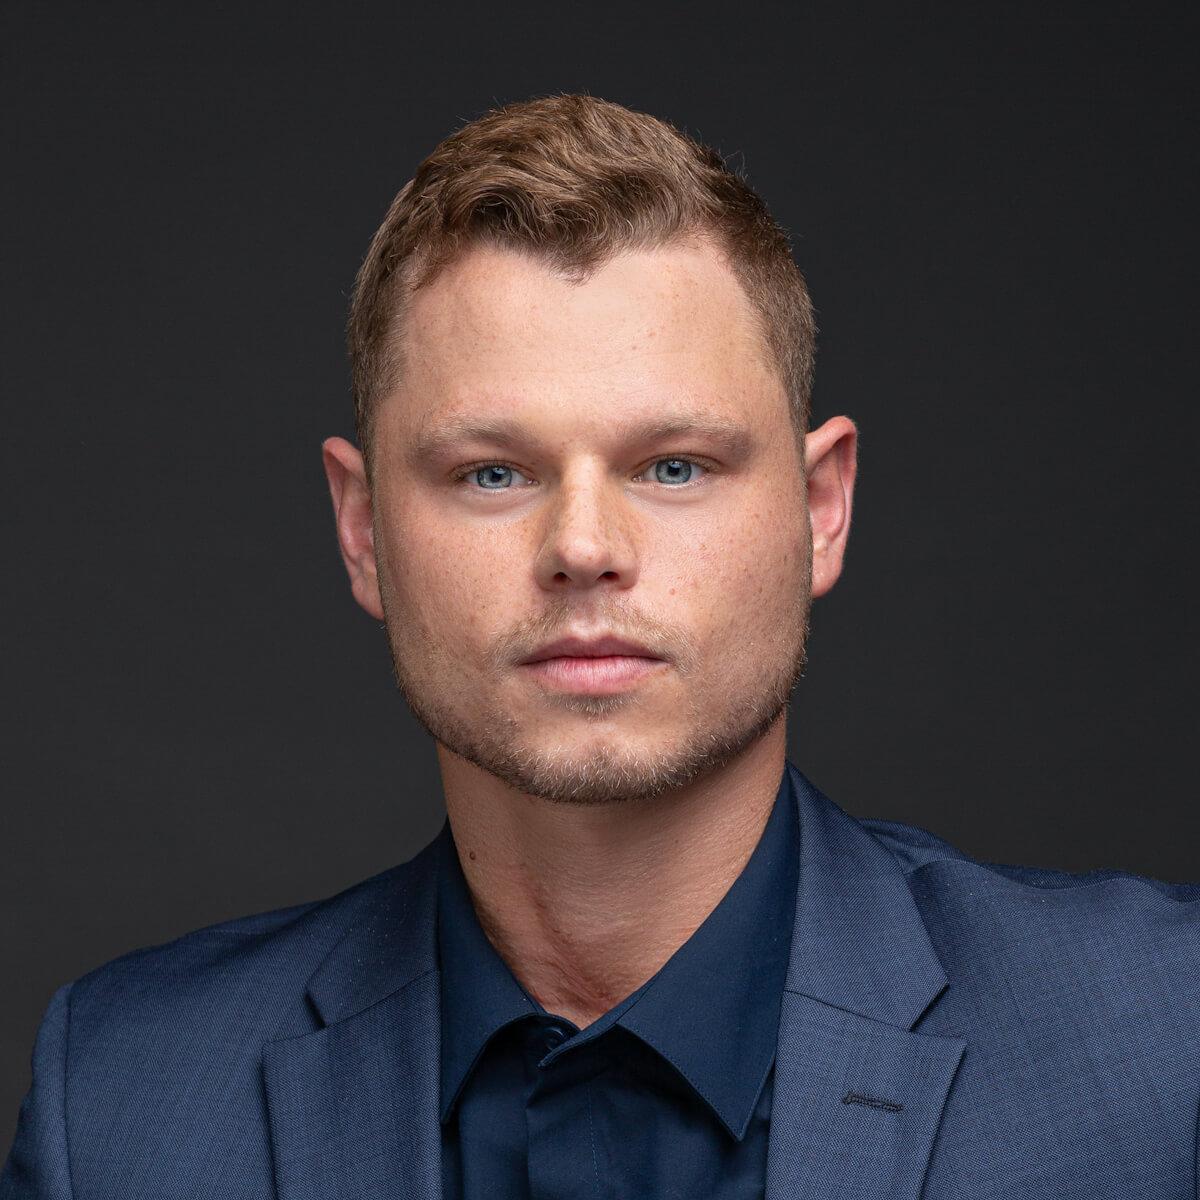 Tyler Webster | TRAXXALL Regional Sales Director Based in California